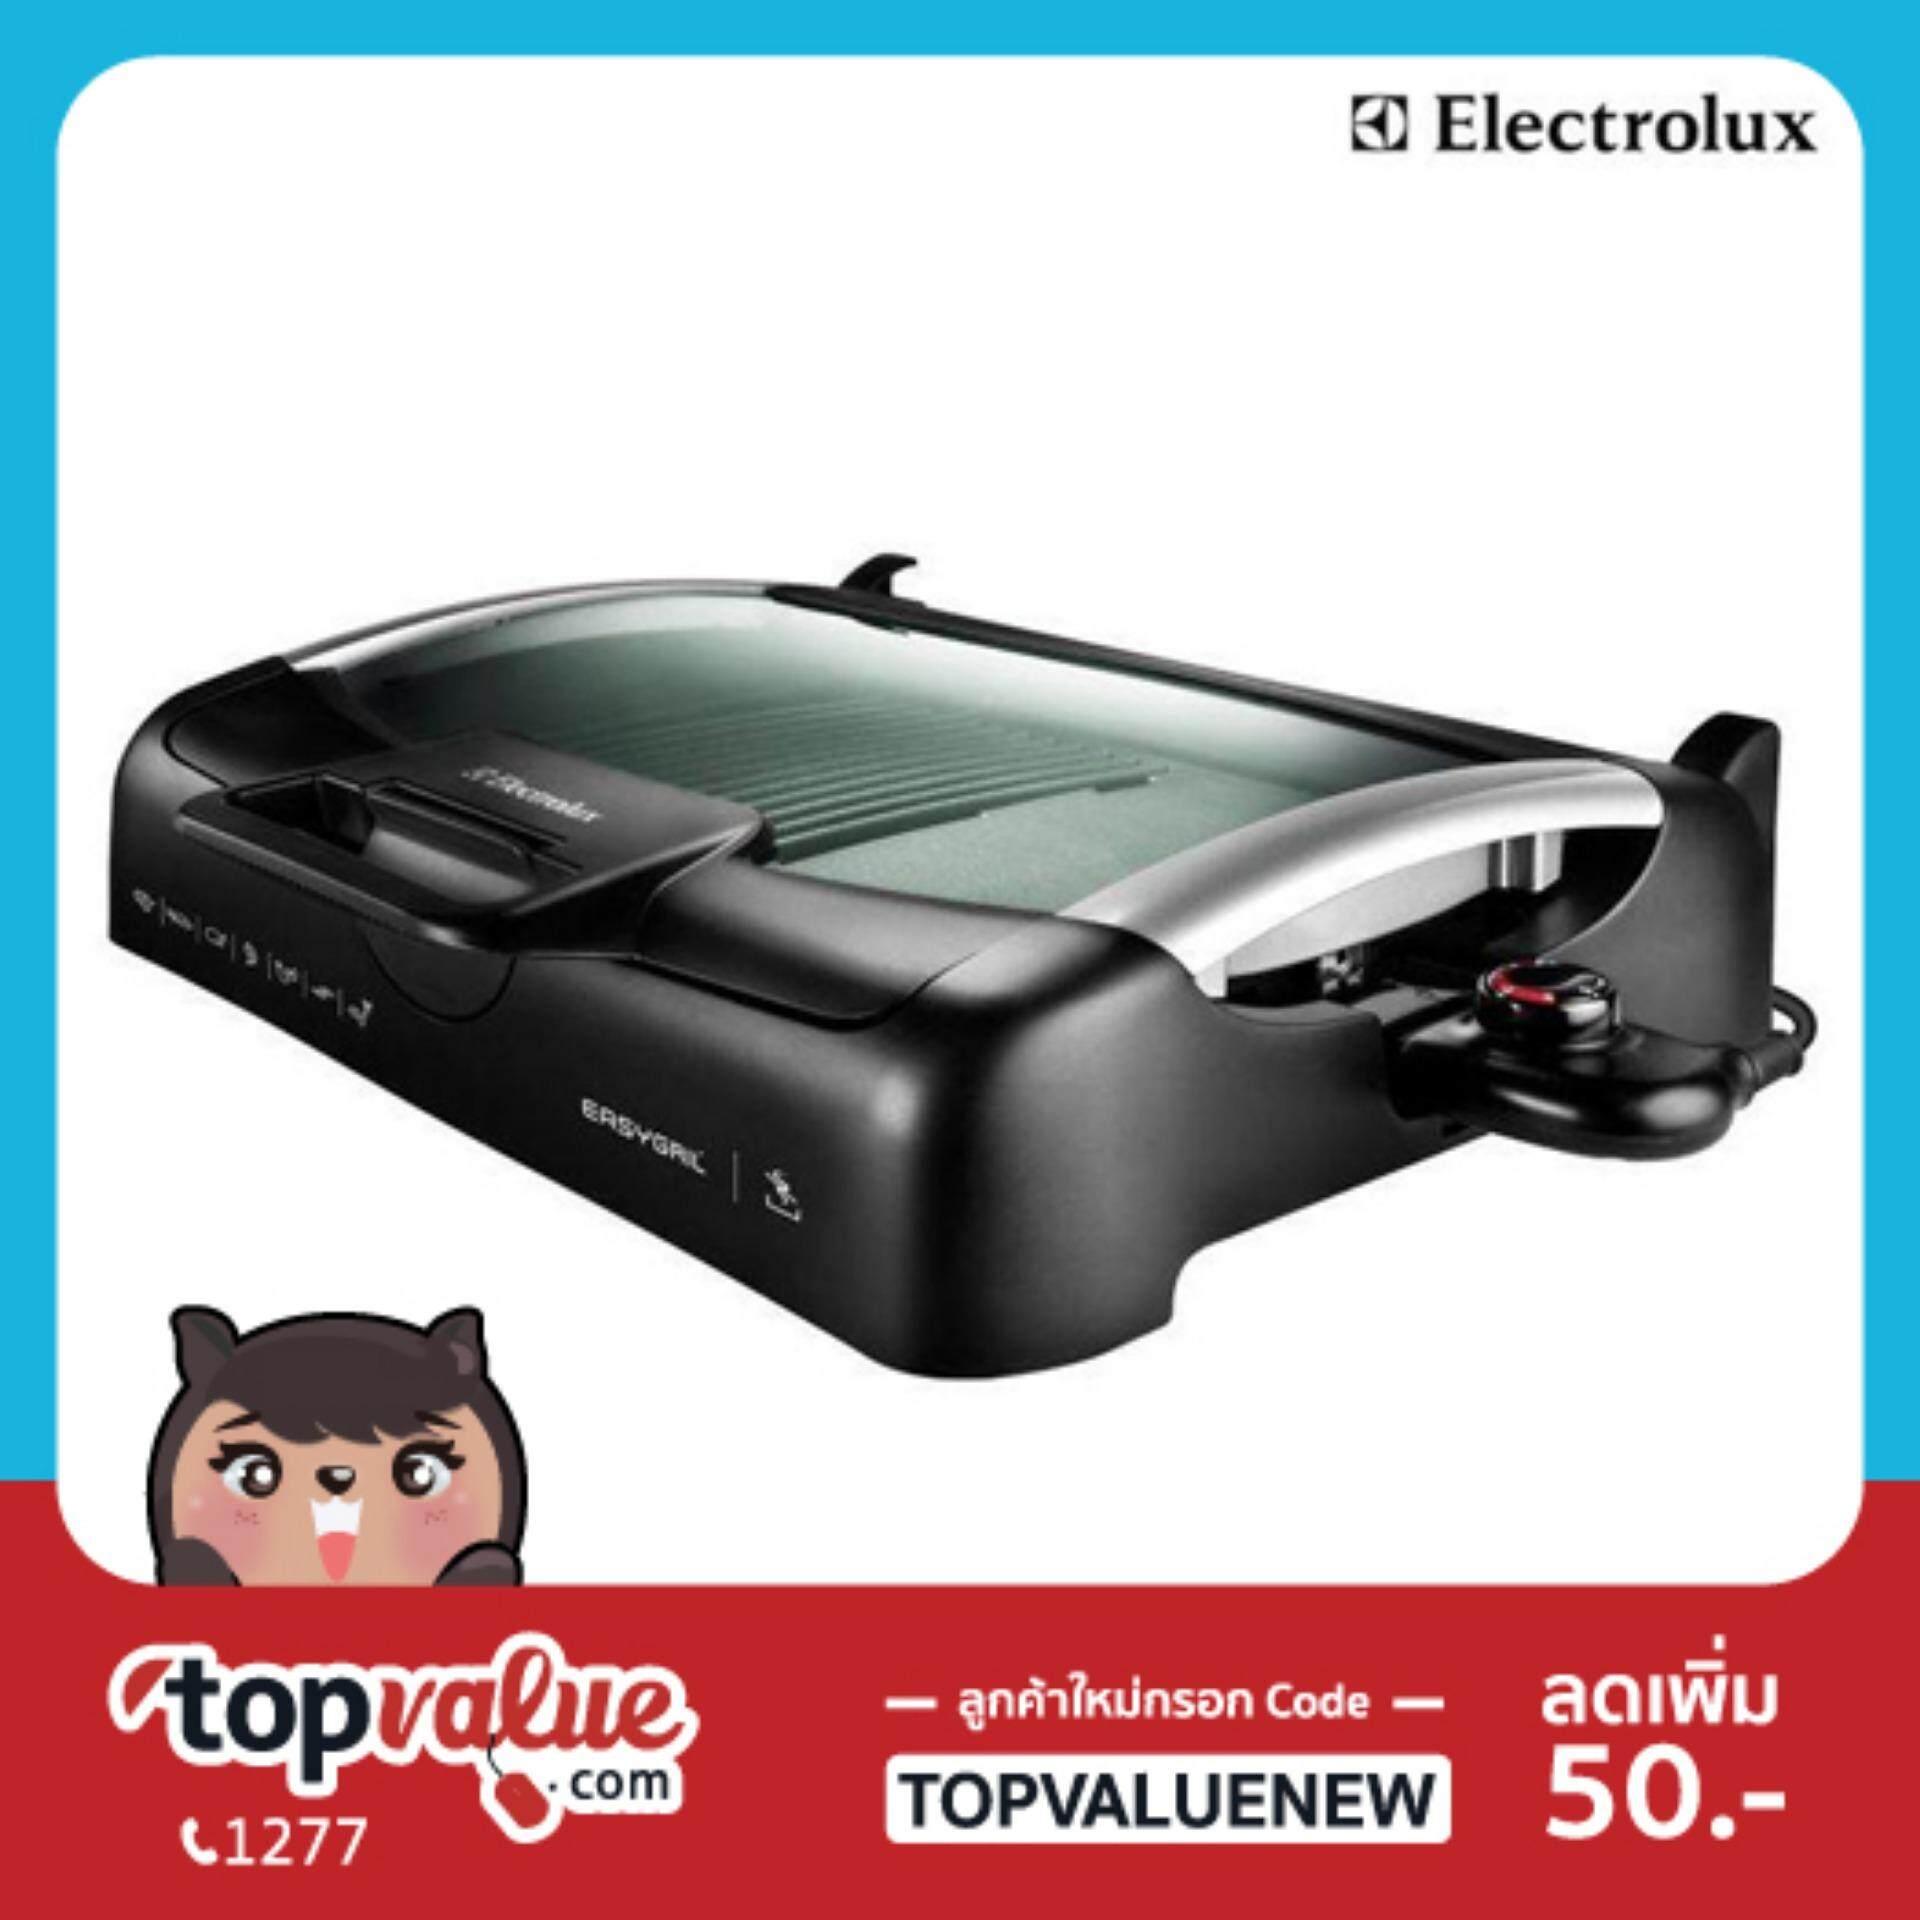 ELECTROLUX เตาย่างไฟฟ้า 2200W. รุ่น EBG200 - BLACK